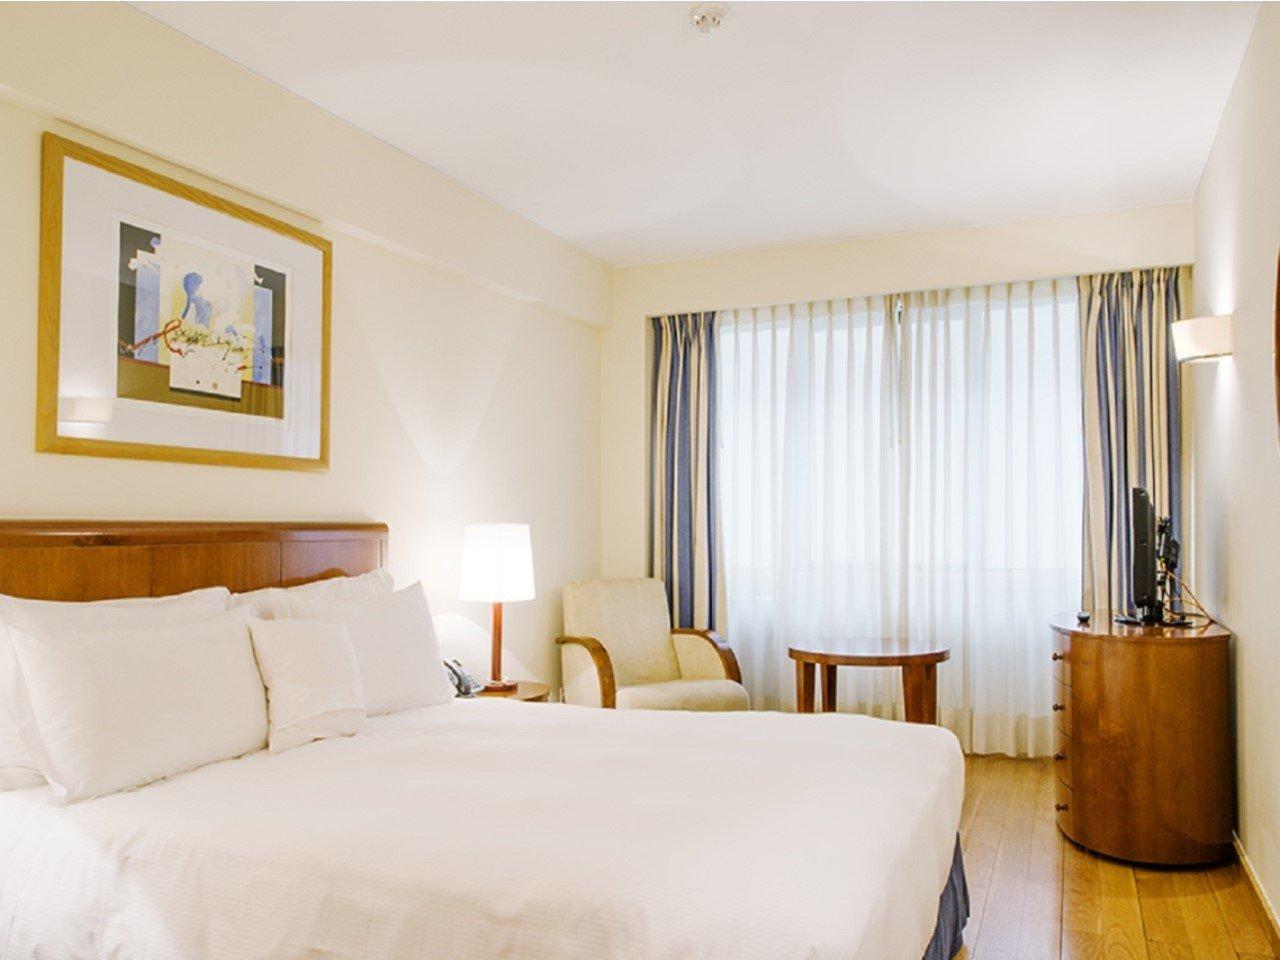 BuyPortugal Property:1 Bedroom Apartment Lisbon, Lisbon ...